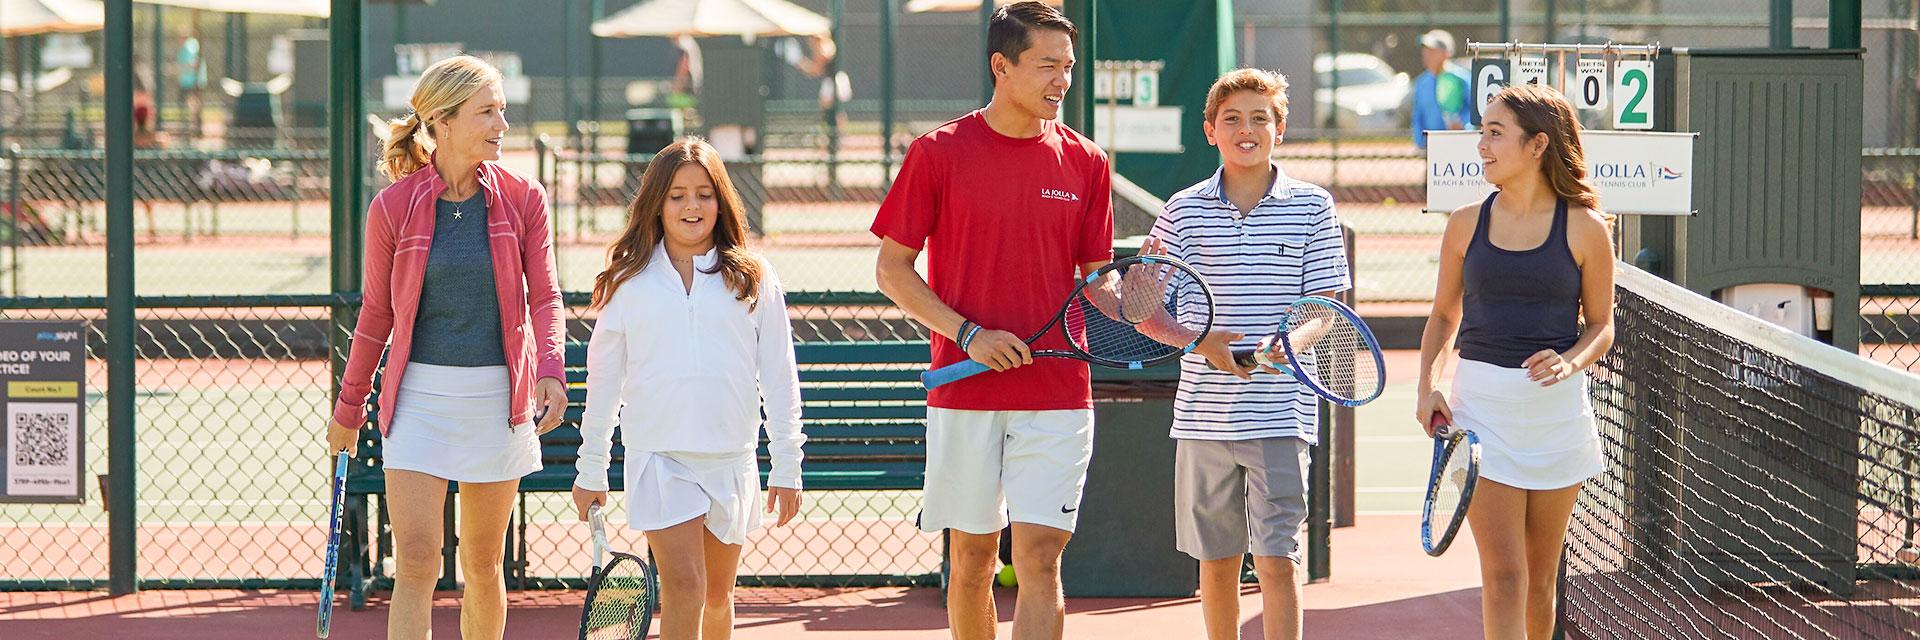 Our Staff at La Jolla Beach And Tennis Club, California